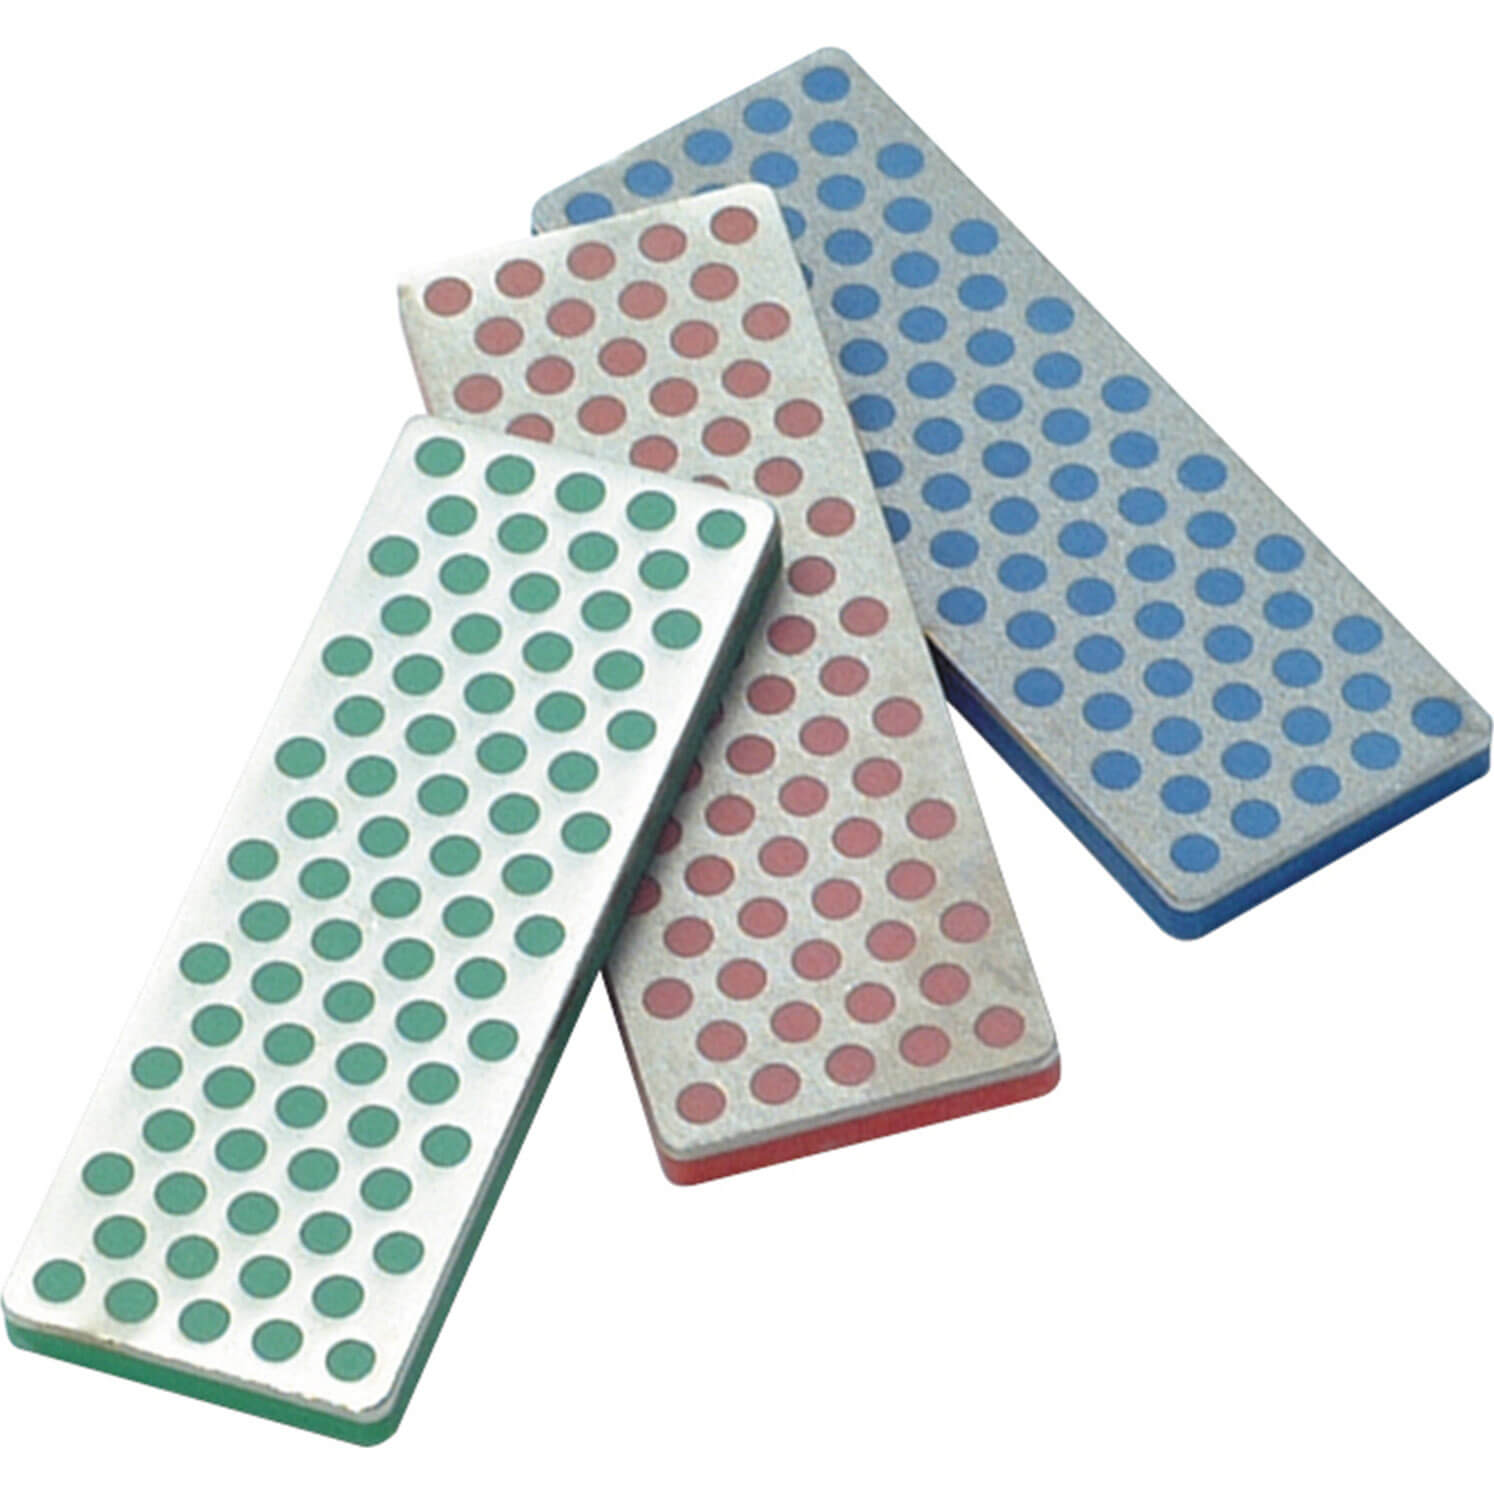 DMT 3 Piece Mini Diamond Whetstone Sharpening Set